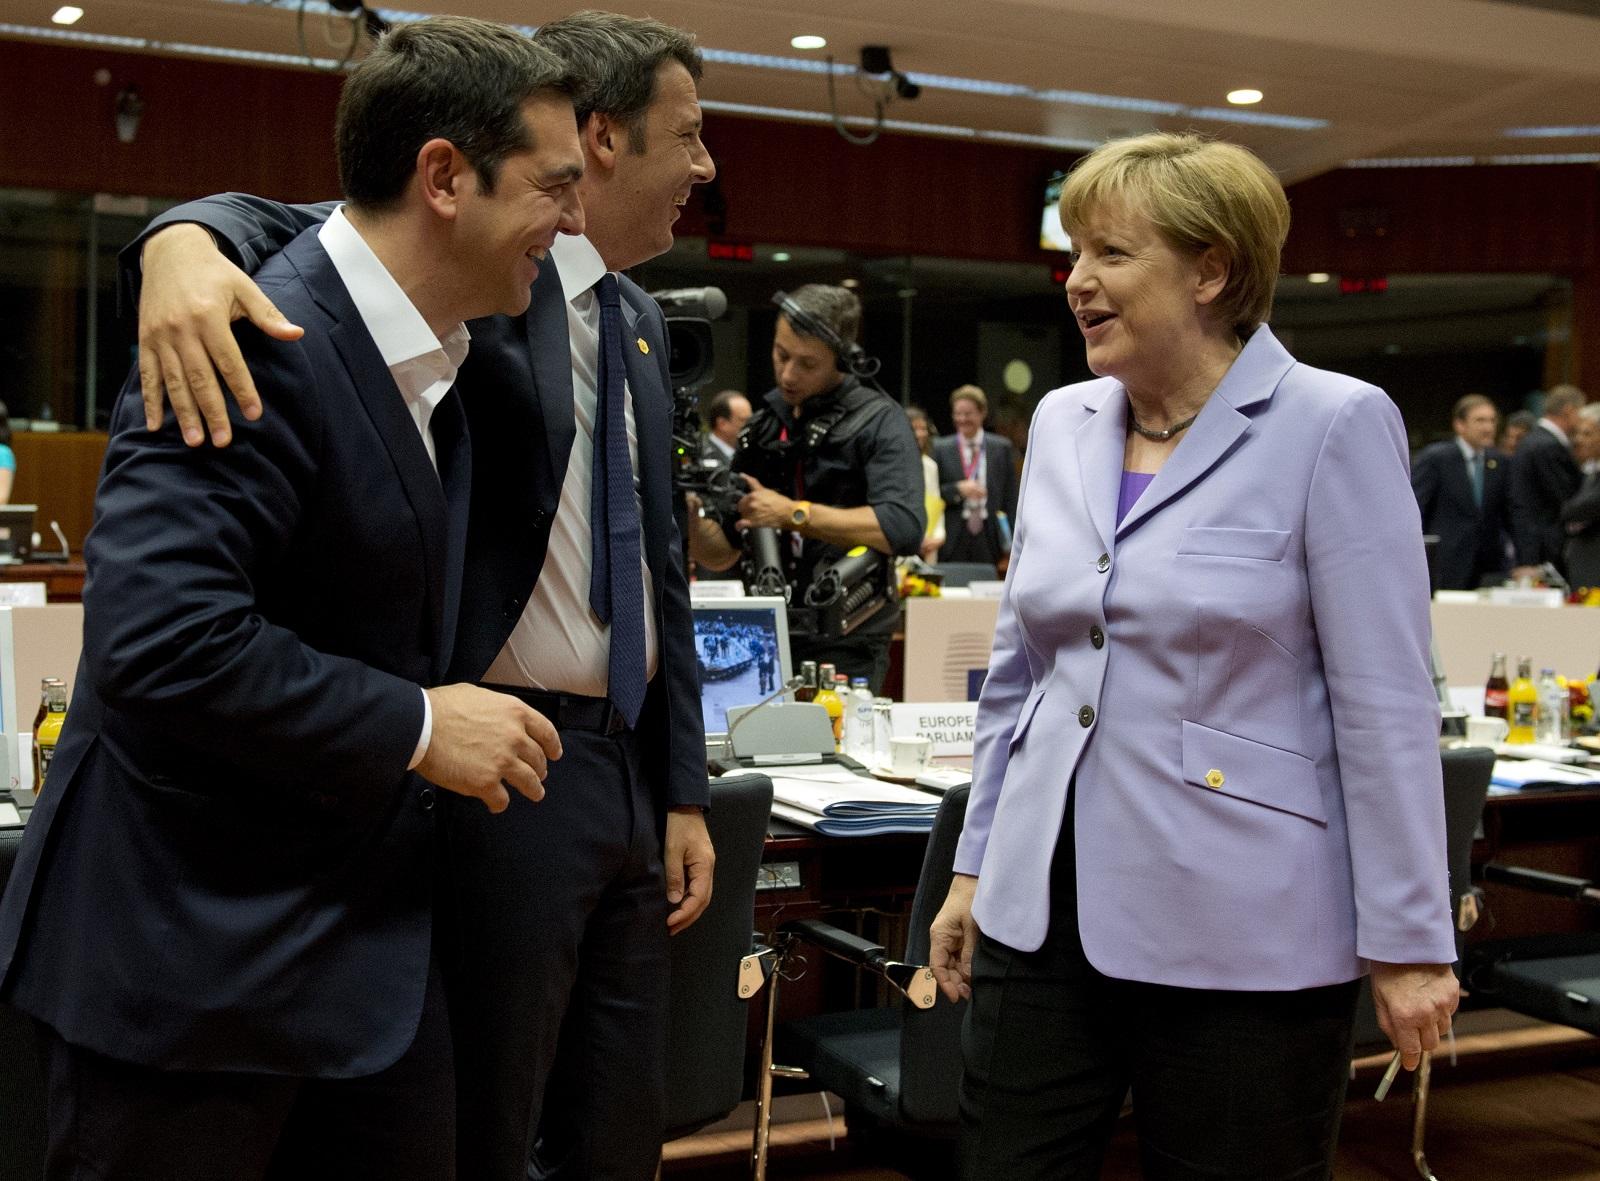 Alexis Tsipras & Angela Merkel